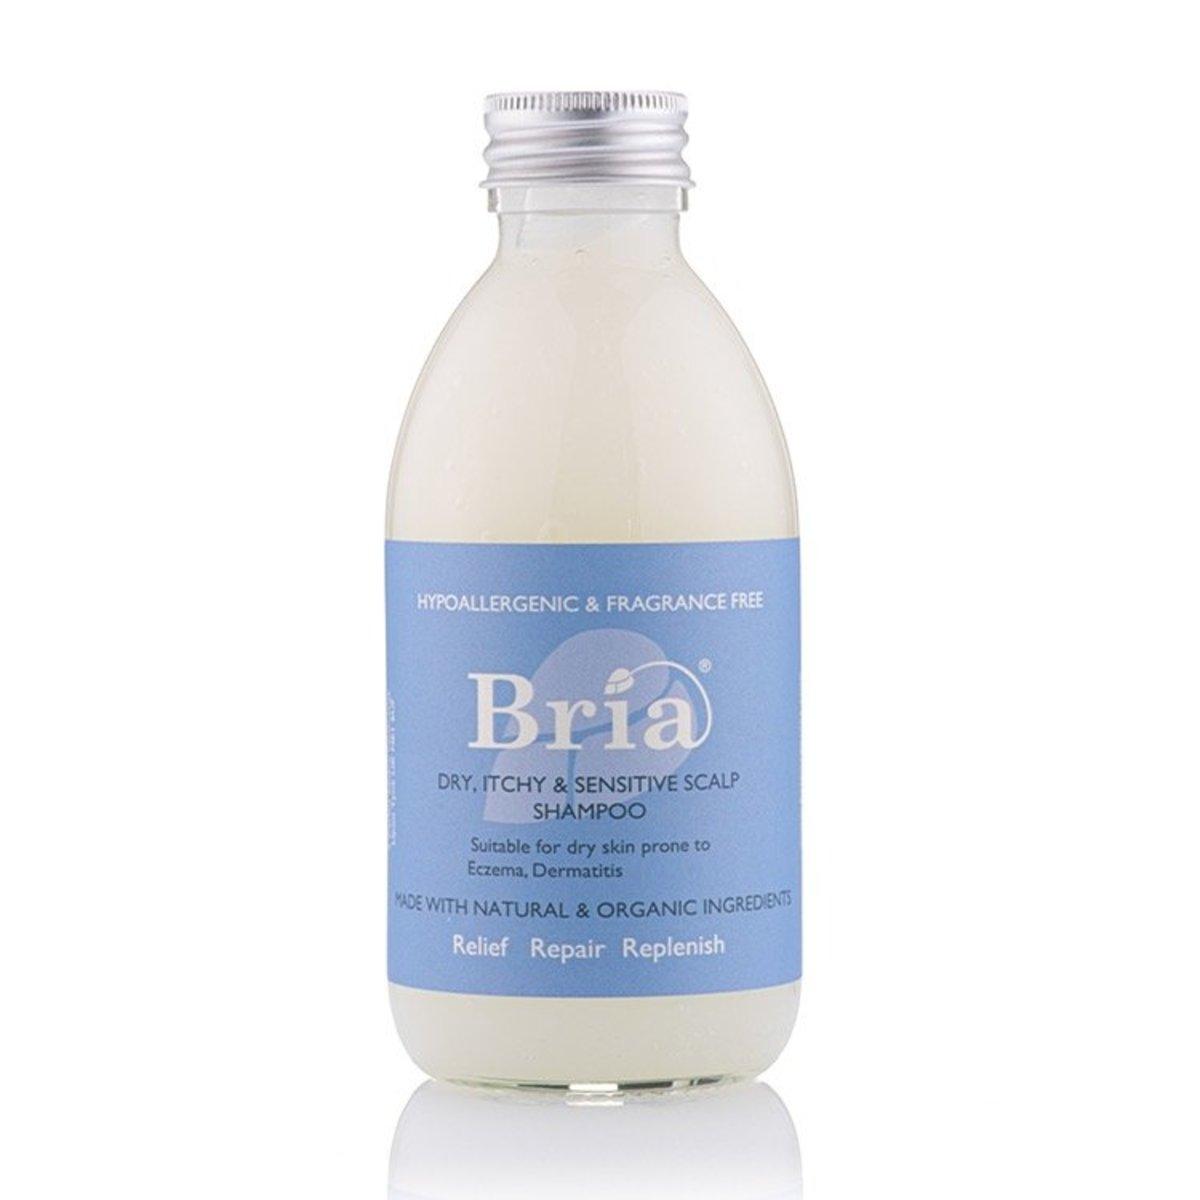 Mild Shampoo for Eczema, Dermatitis, Dry Itchy Irritated Scalp